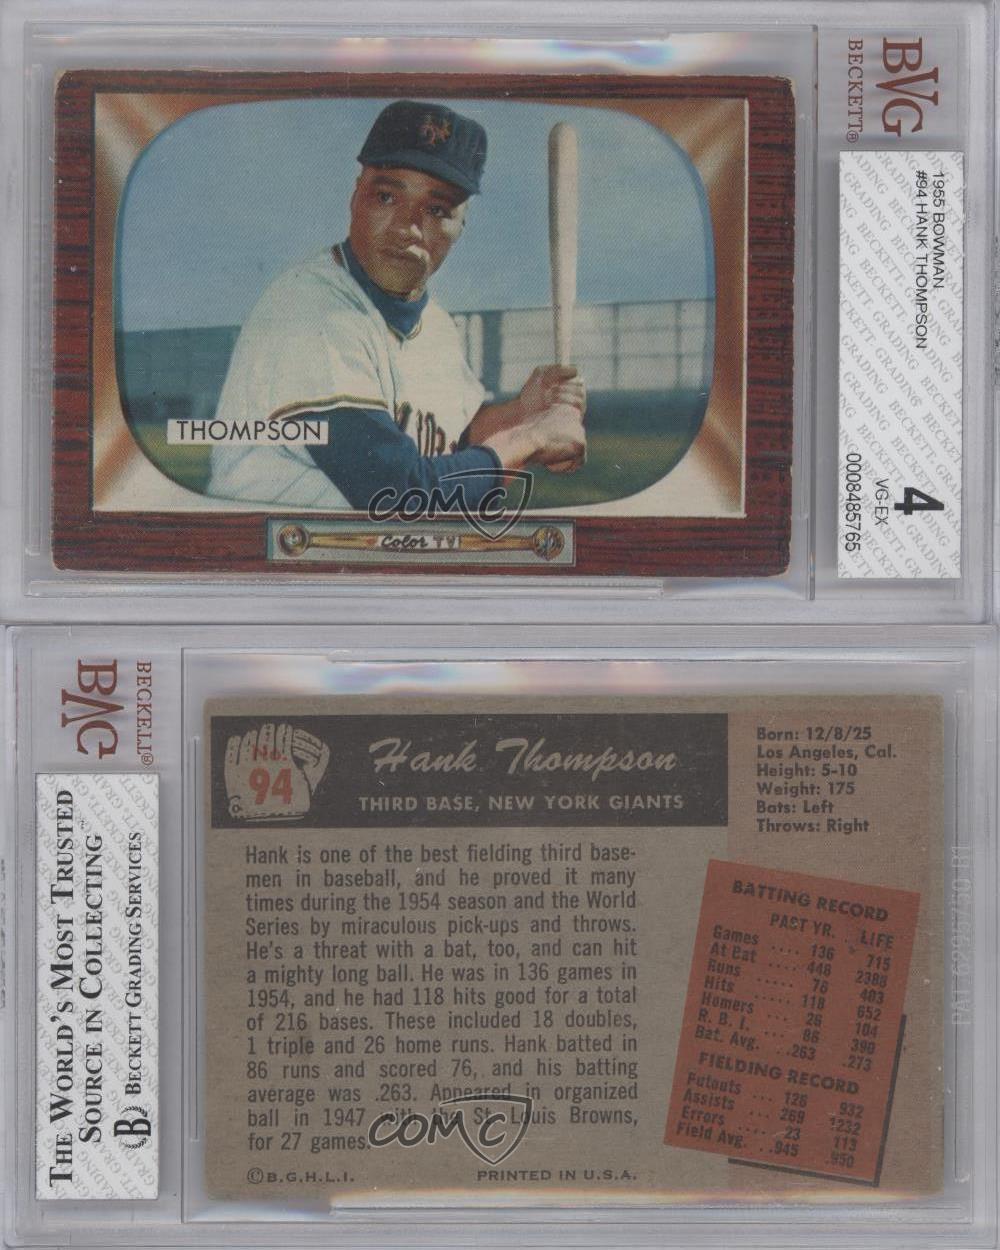 1955 bowman 94 hank thompson bvg 4 new york giants baseball card ebay. Black Bedroom Furniture Sets. Home Design Ideas